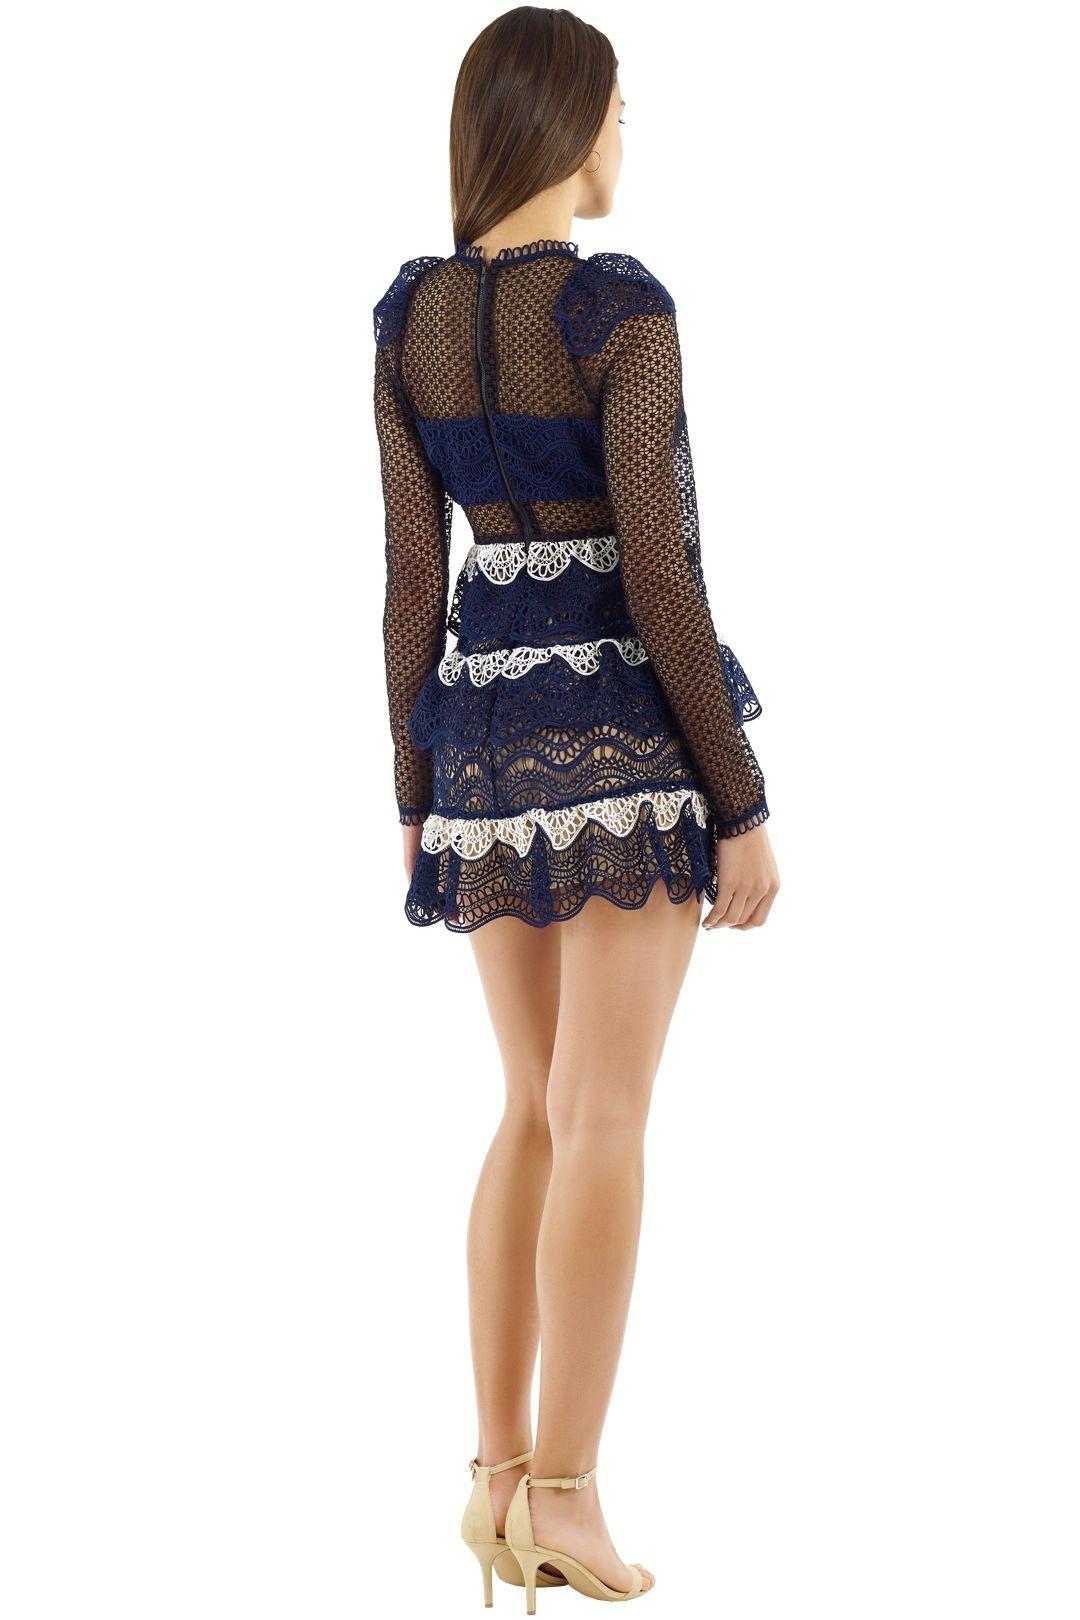 Self Portrait - Wave Guipure Mini Dress - Navy - Back